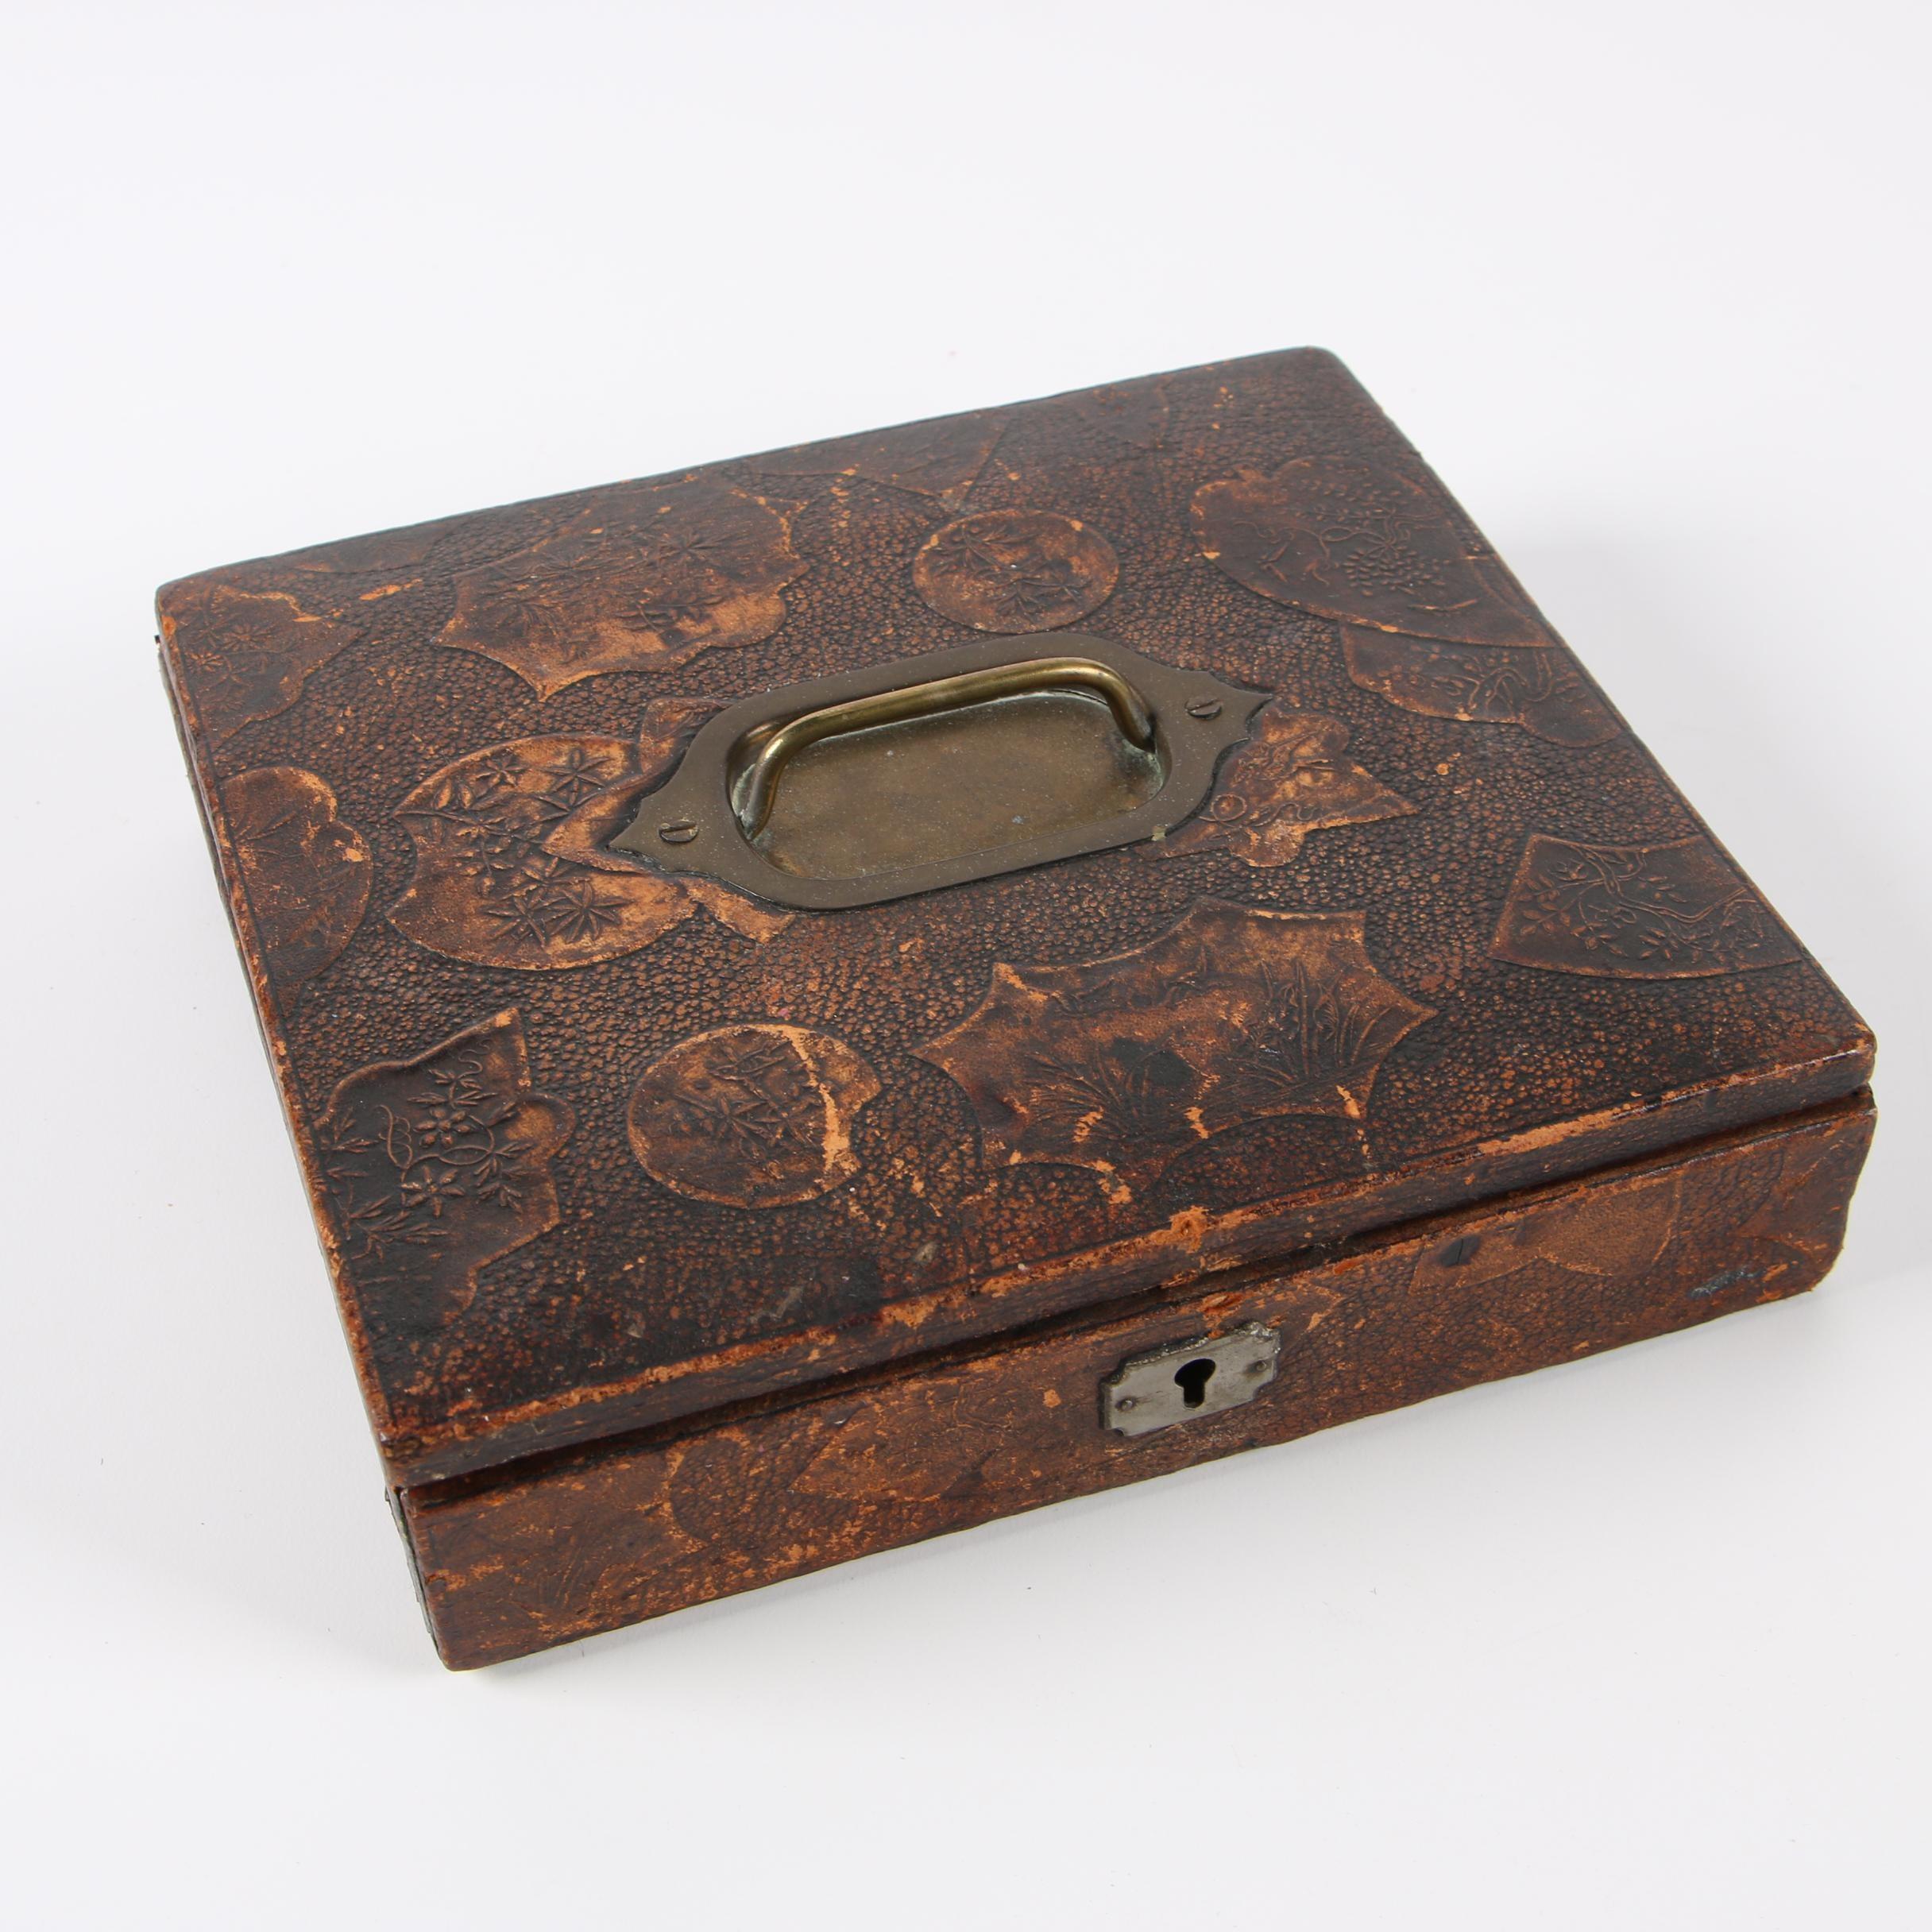 Leatherette Bound Lock Box, circa 1900